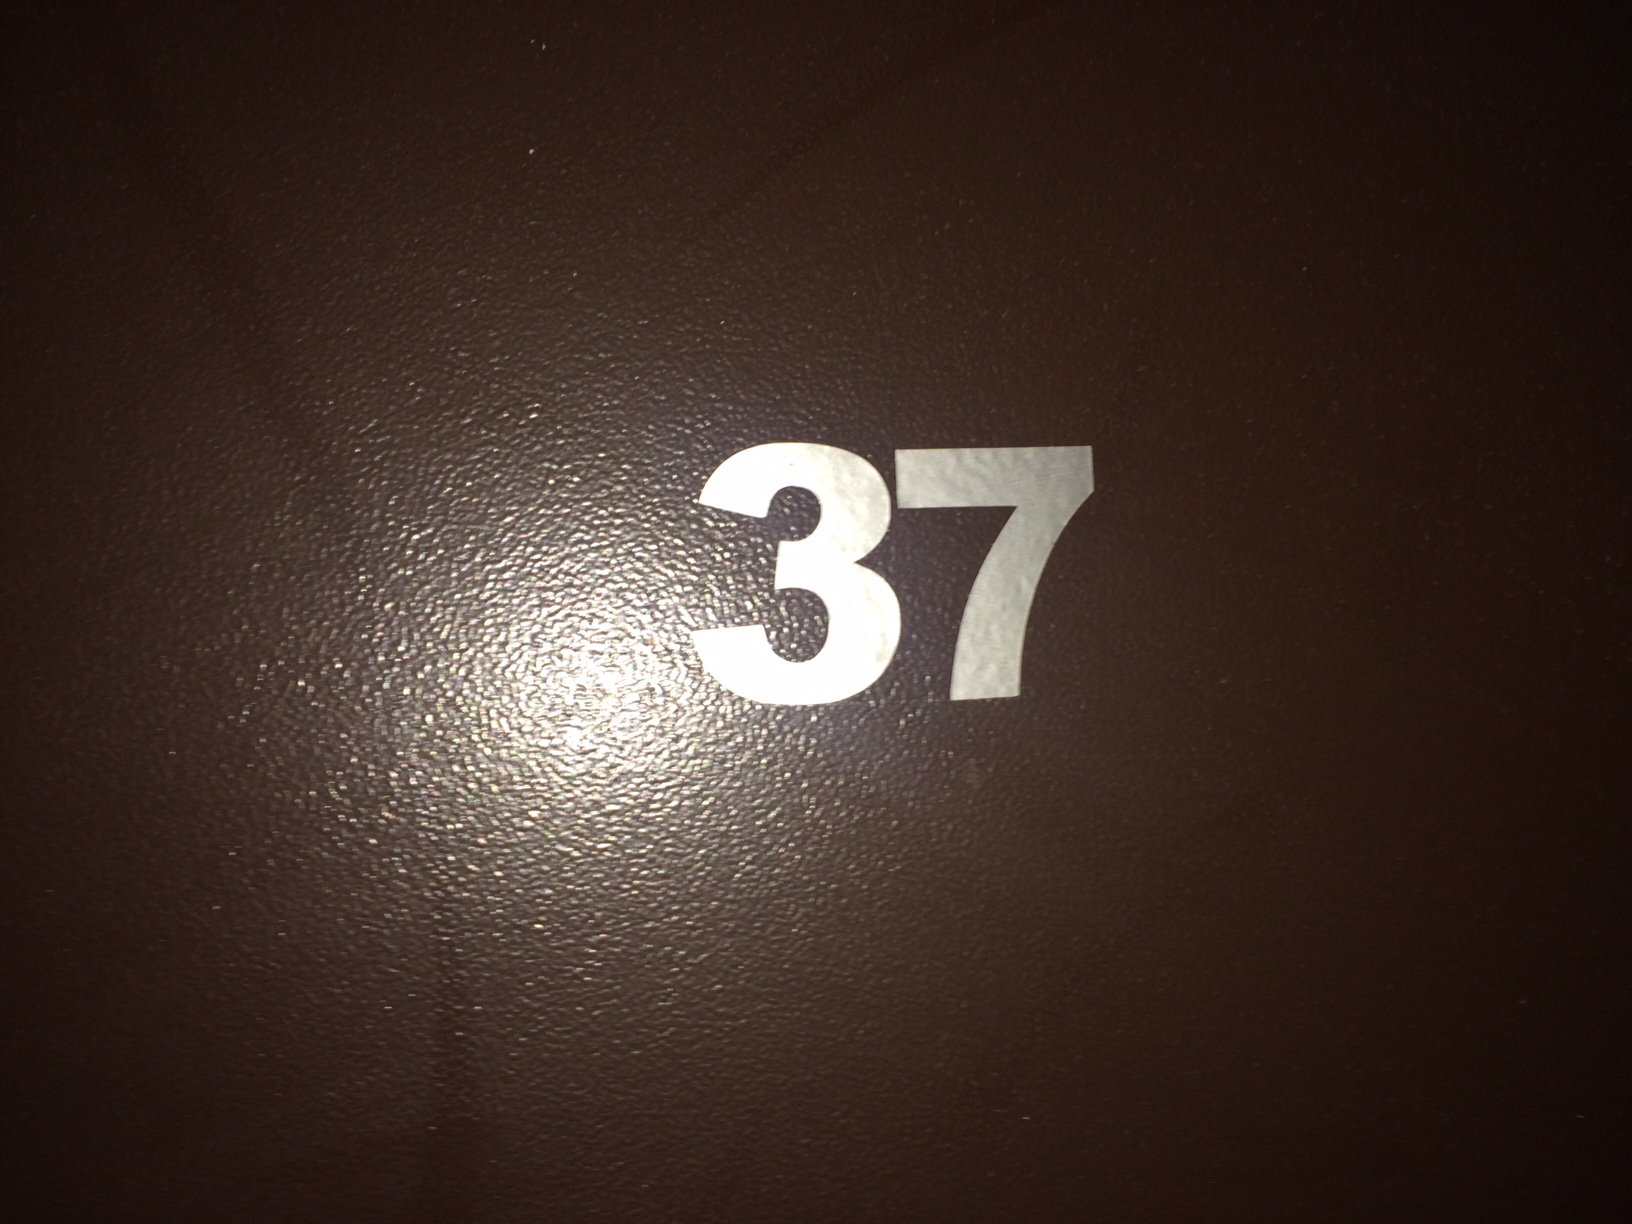 Boxa nr.37, Ansamblul Izvorul Dorului, Sinaia